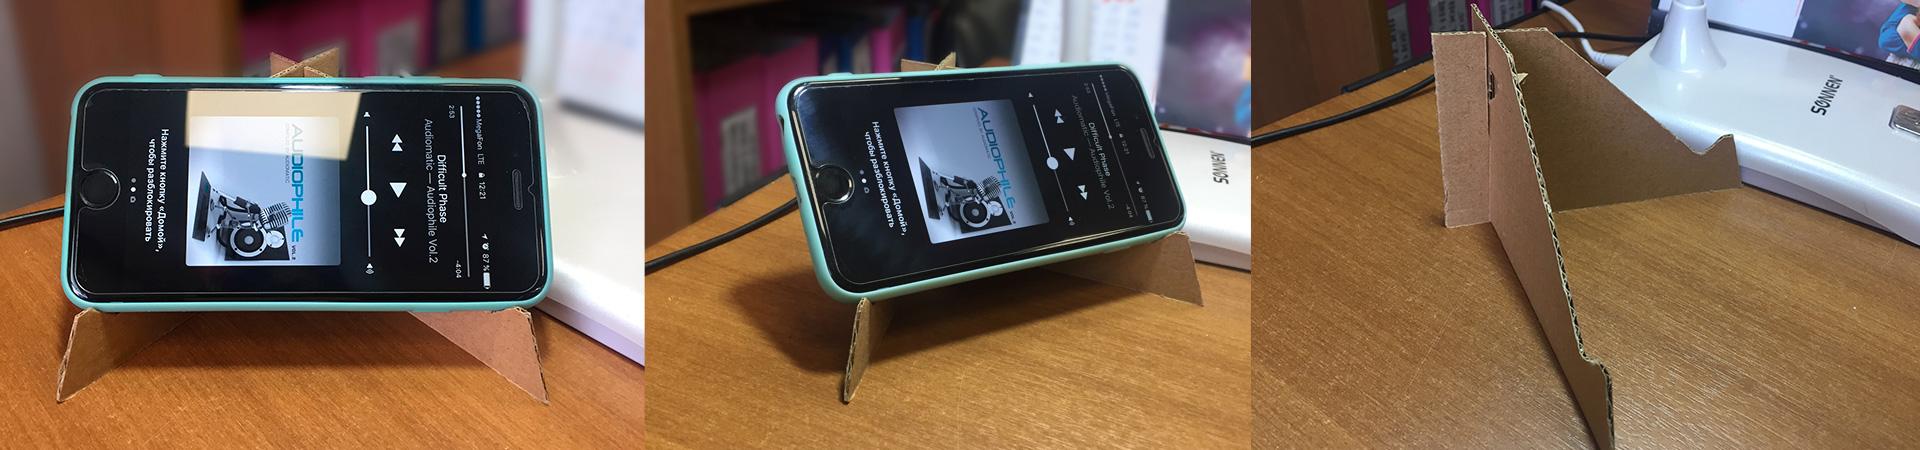 Подставка под телефон своими руками картон фото 98